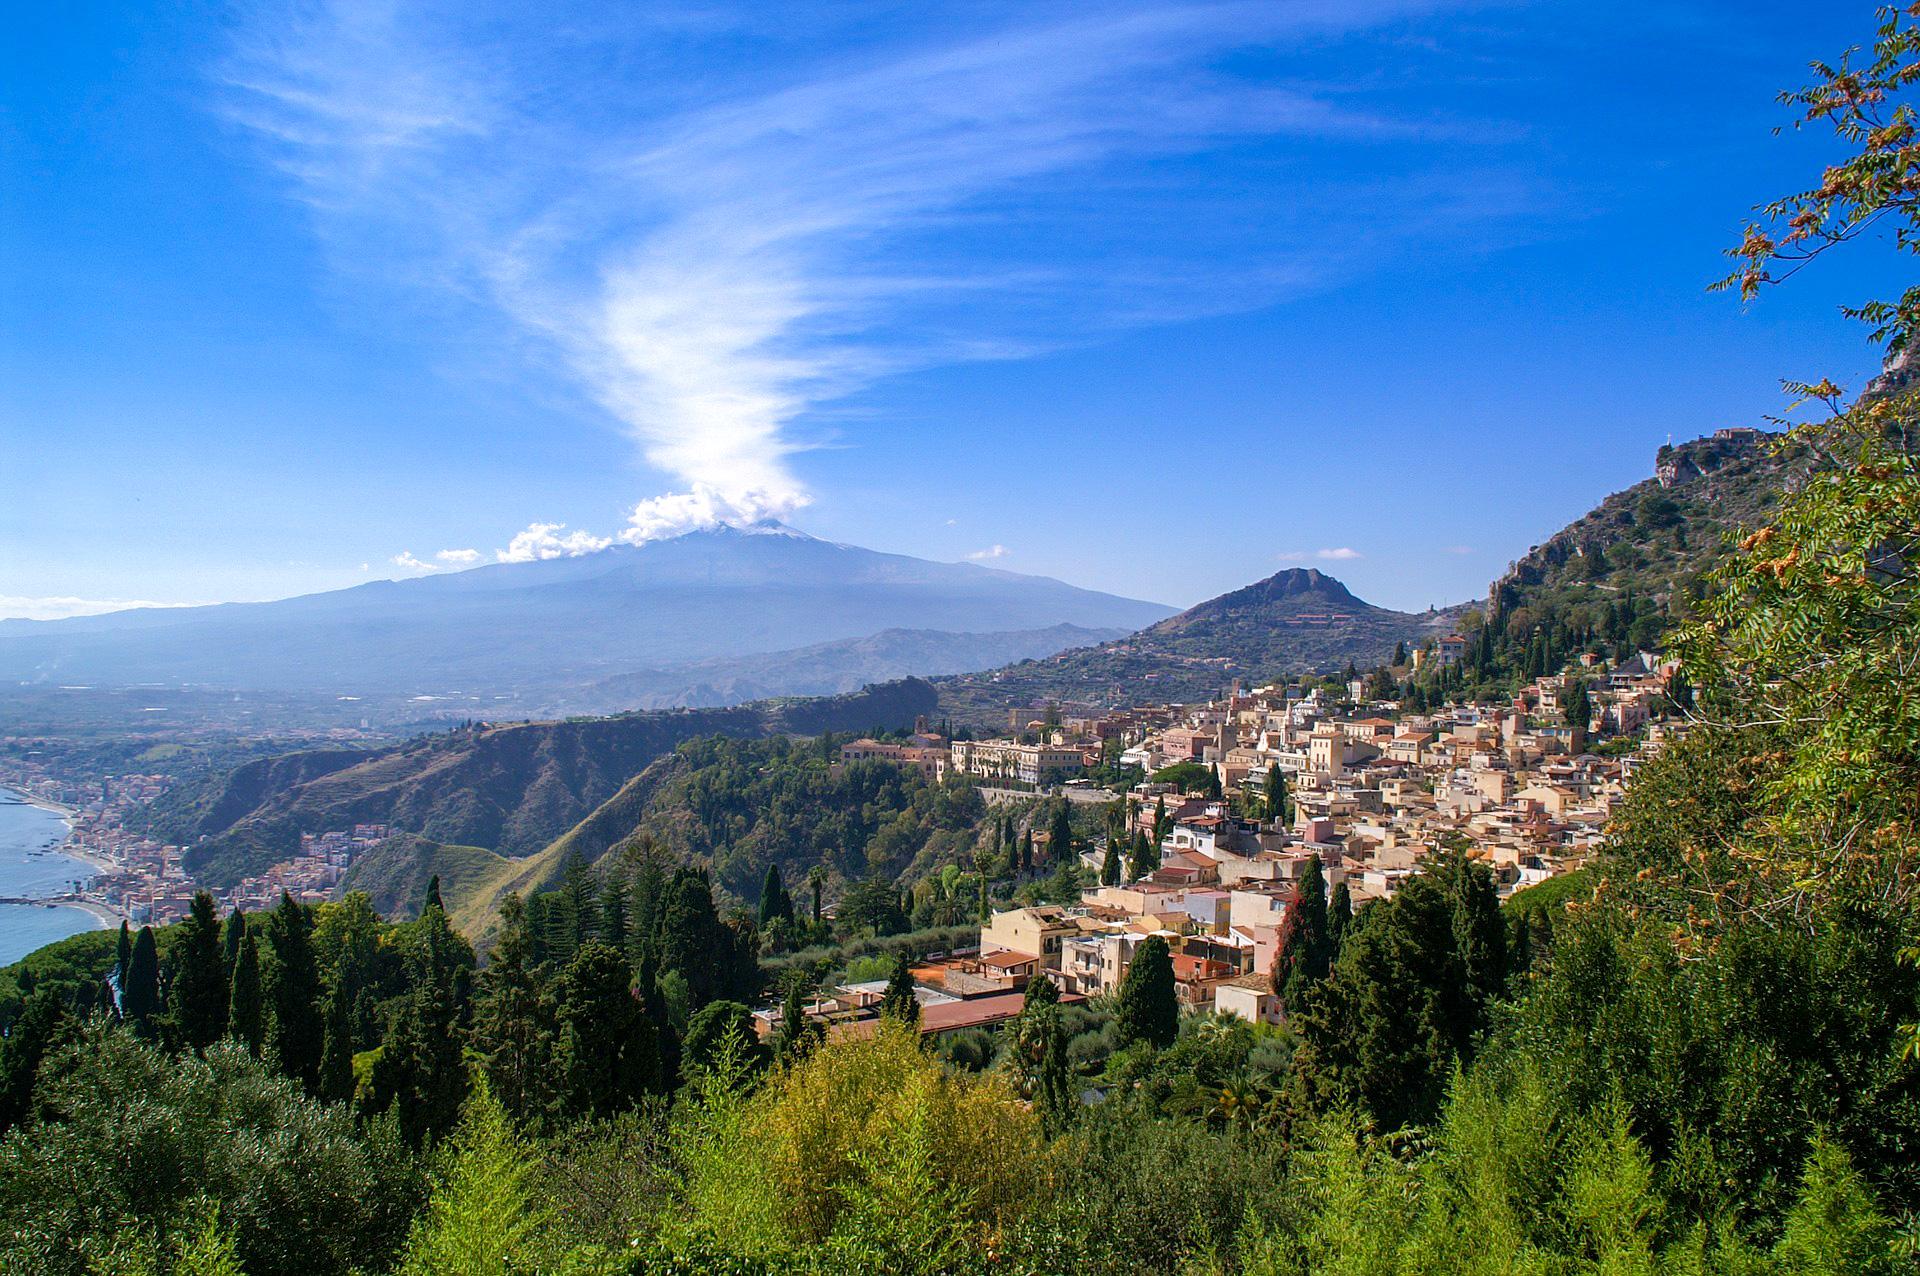 Wandern auf Europas aktivsten Vulkan